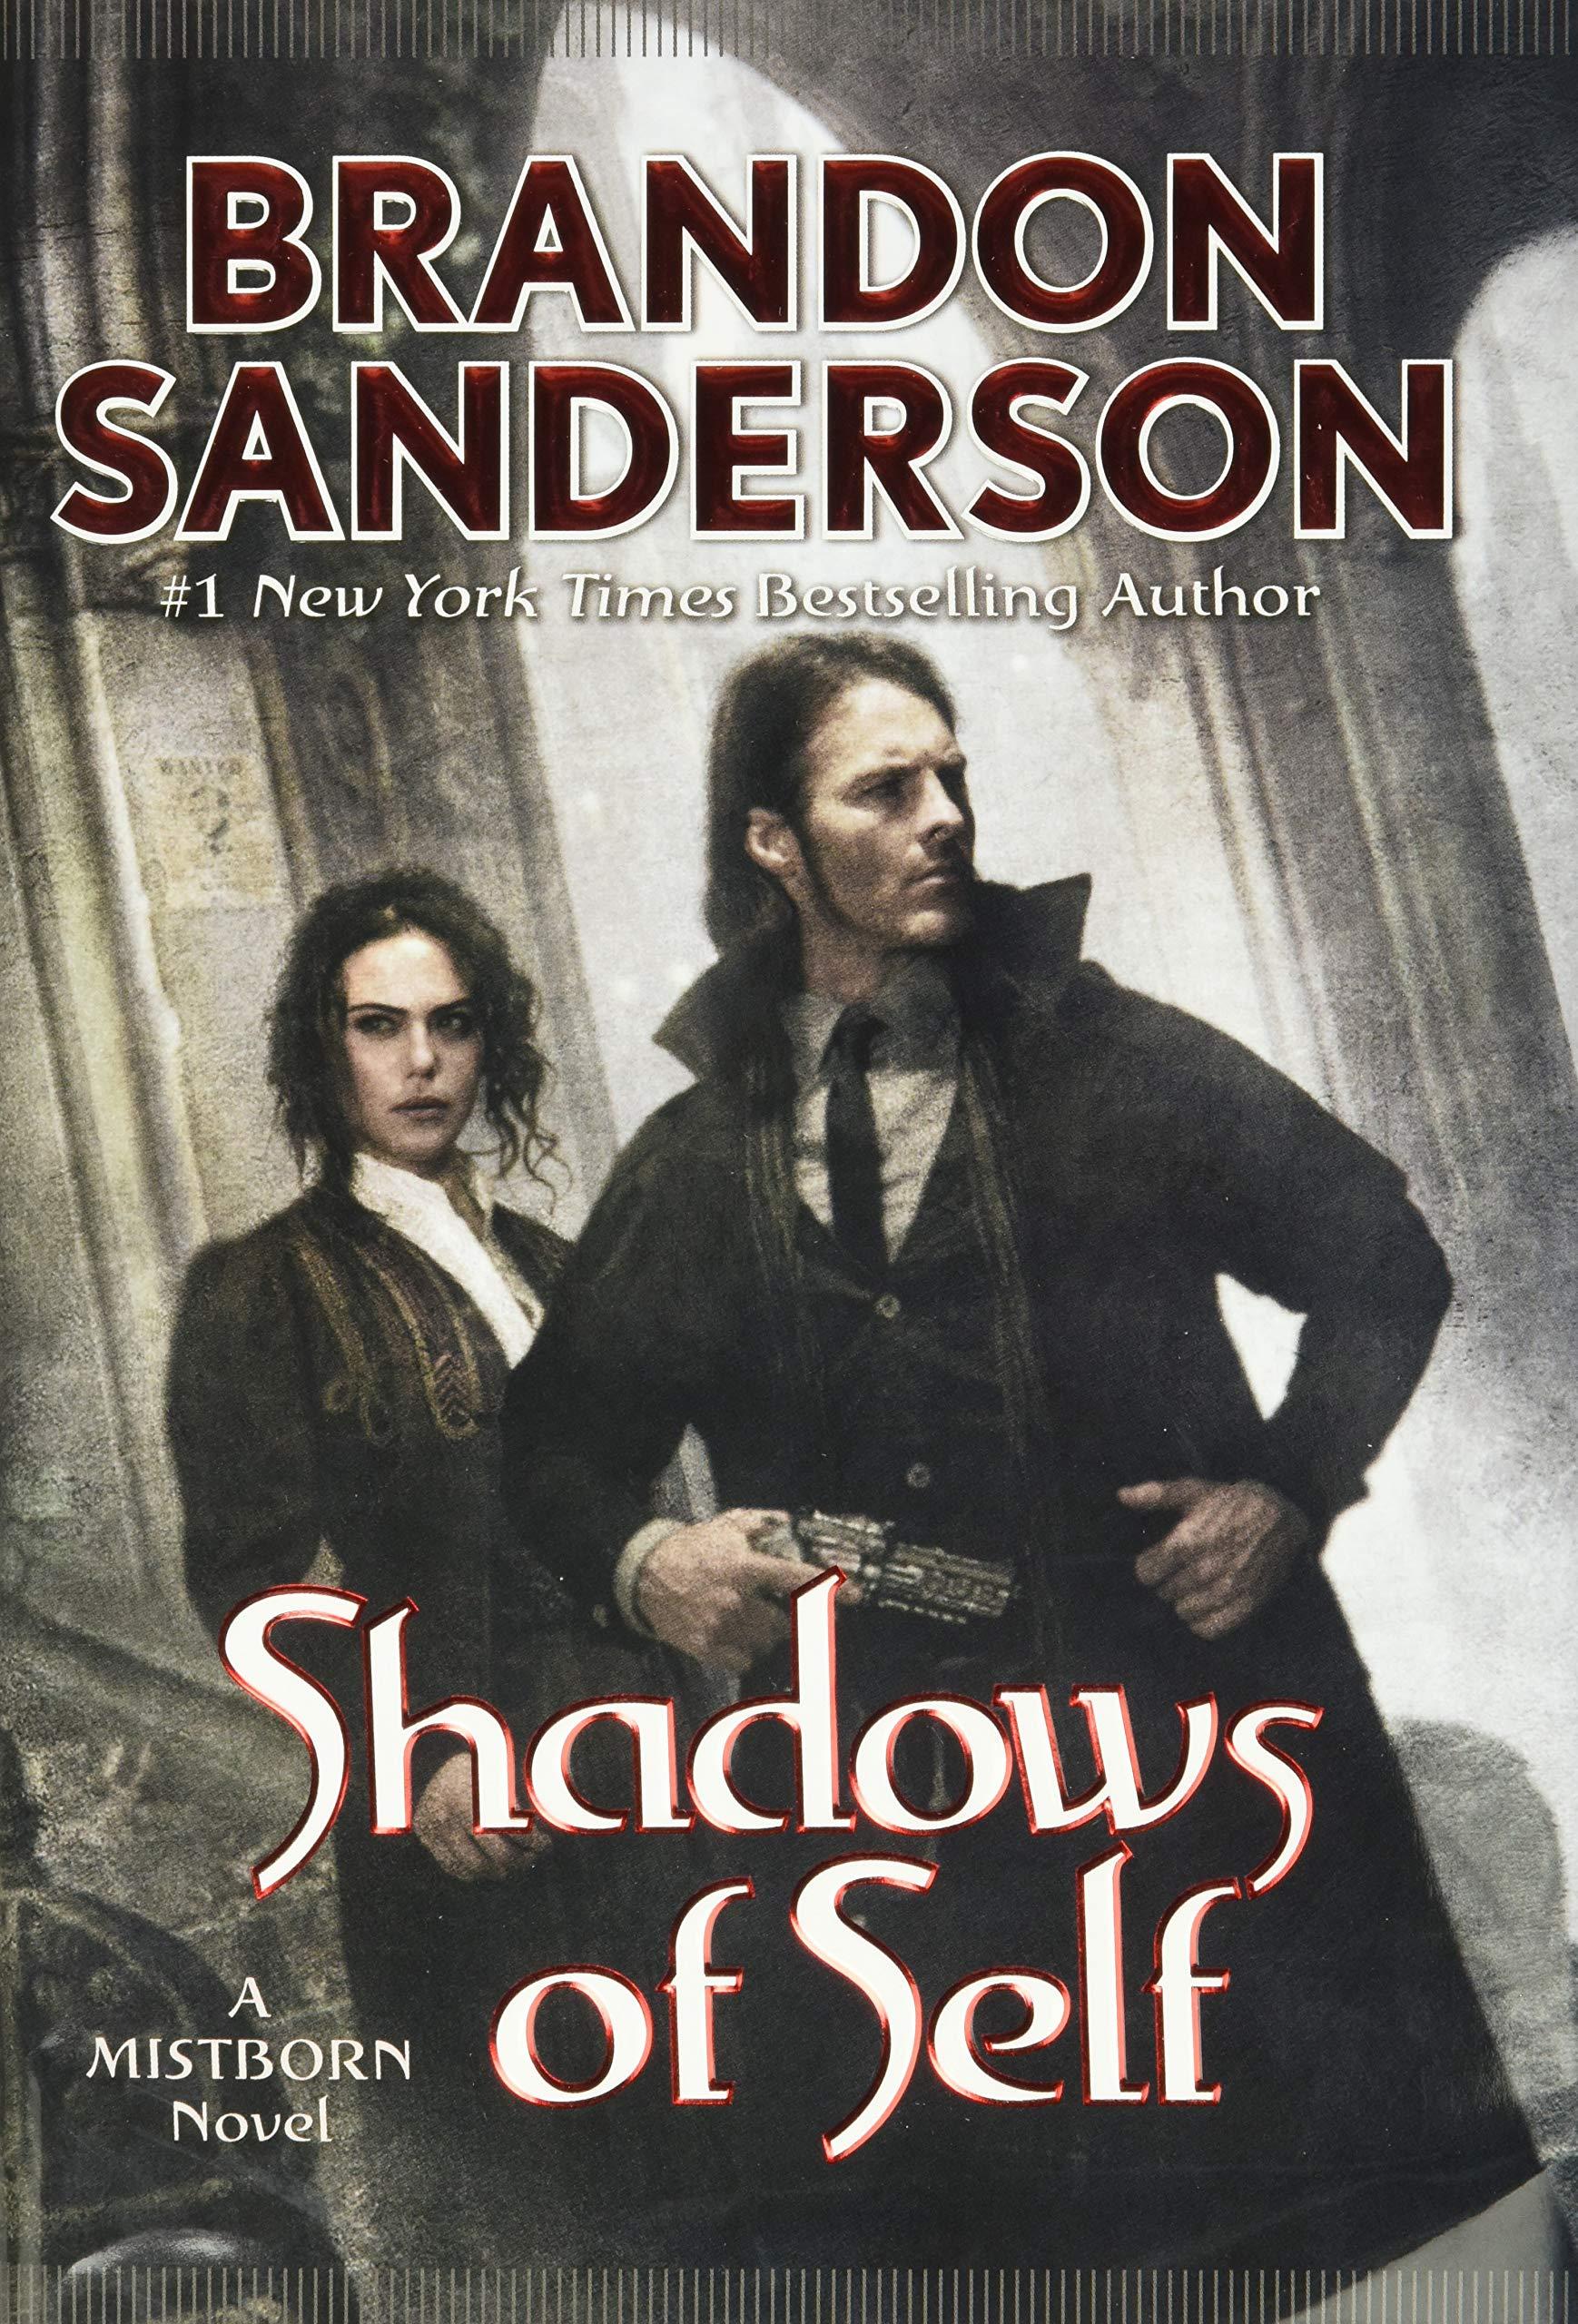 Mistborn #5 Shadows of Self - Brandon Sanderson